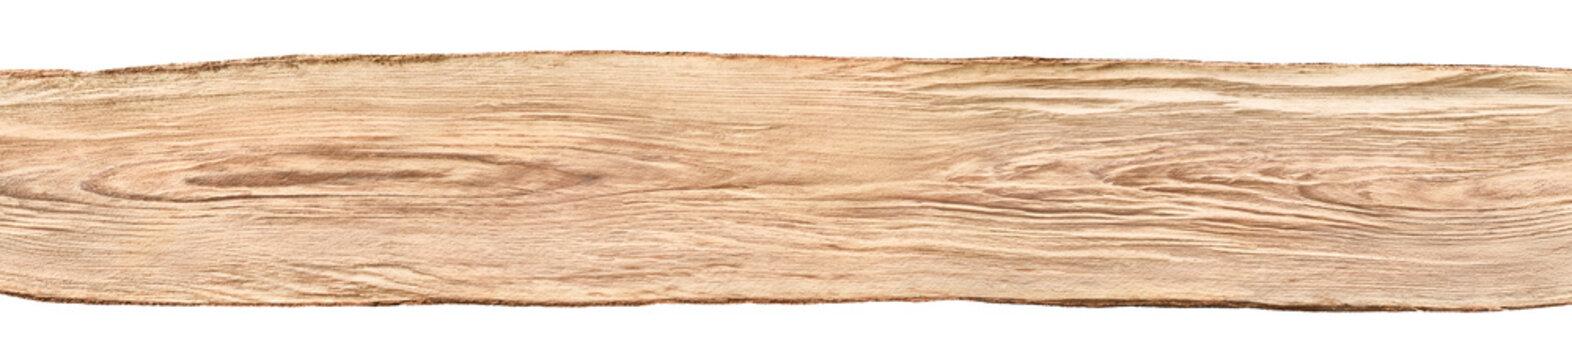 Holzbalken, naturbelassen, im breiten Panorama Format als Banner